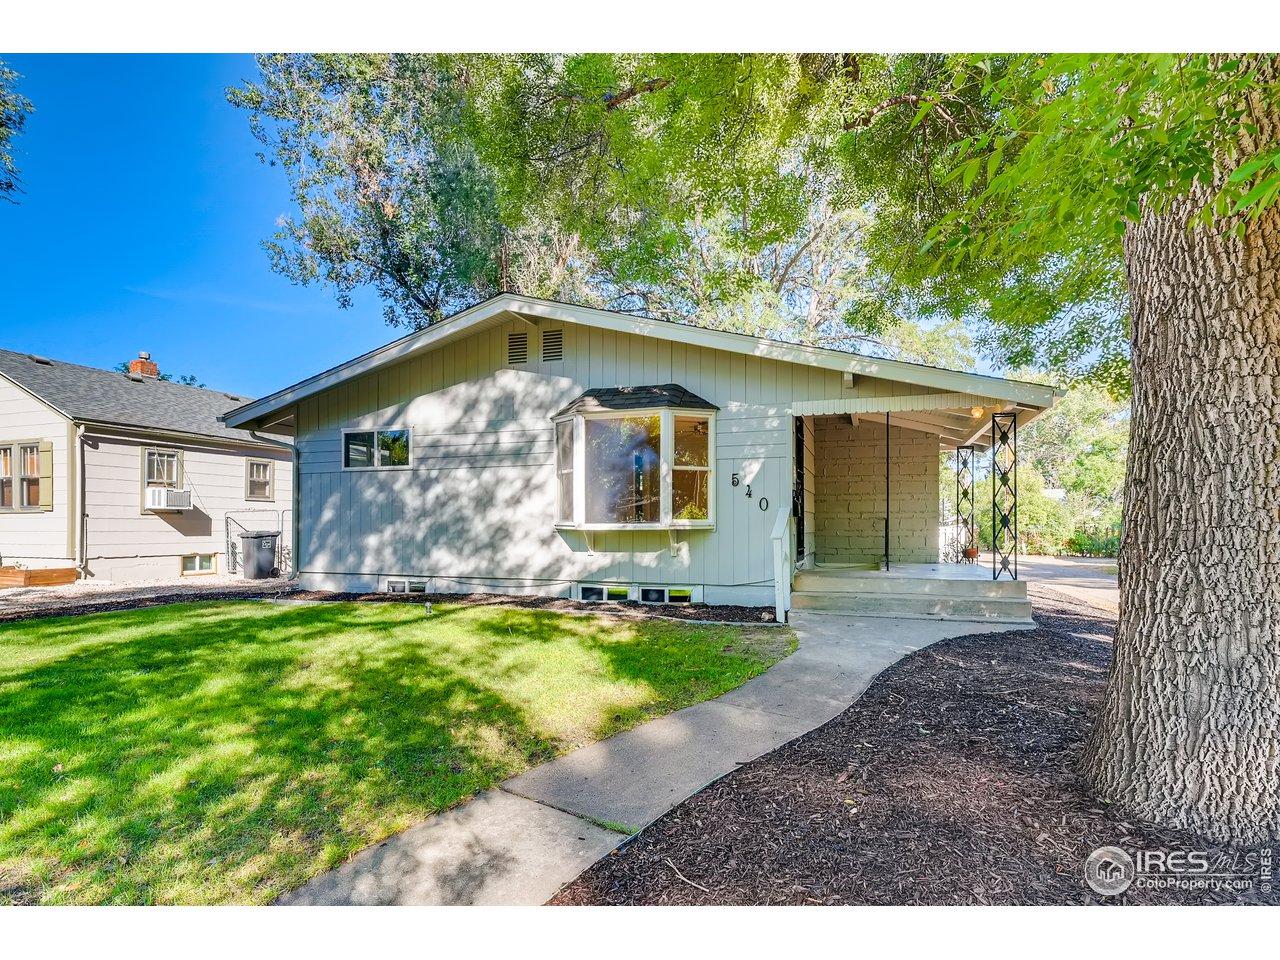 540 Sheridan Ave, Loveland CO 80537